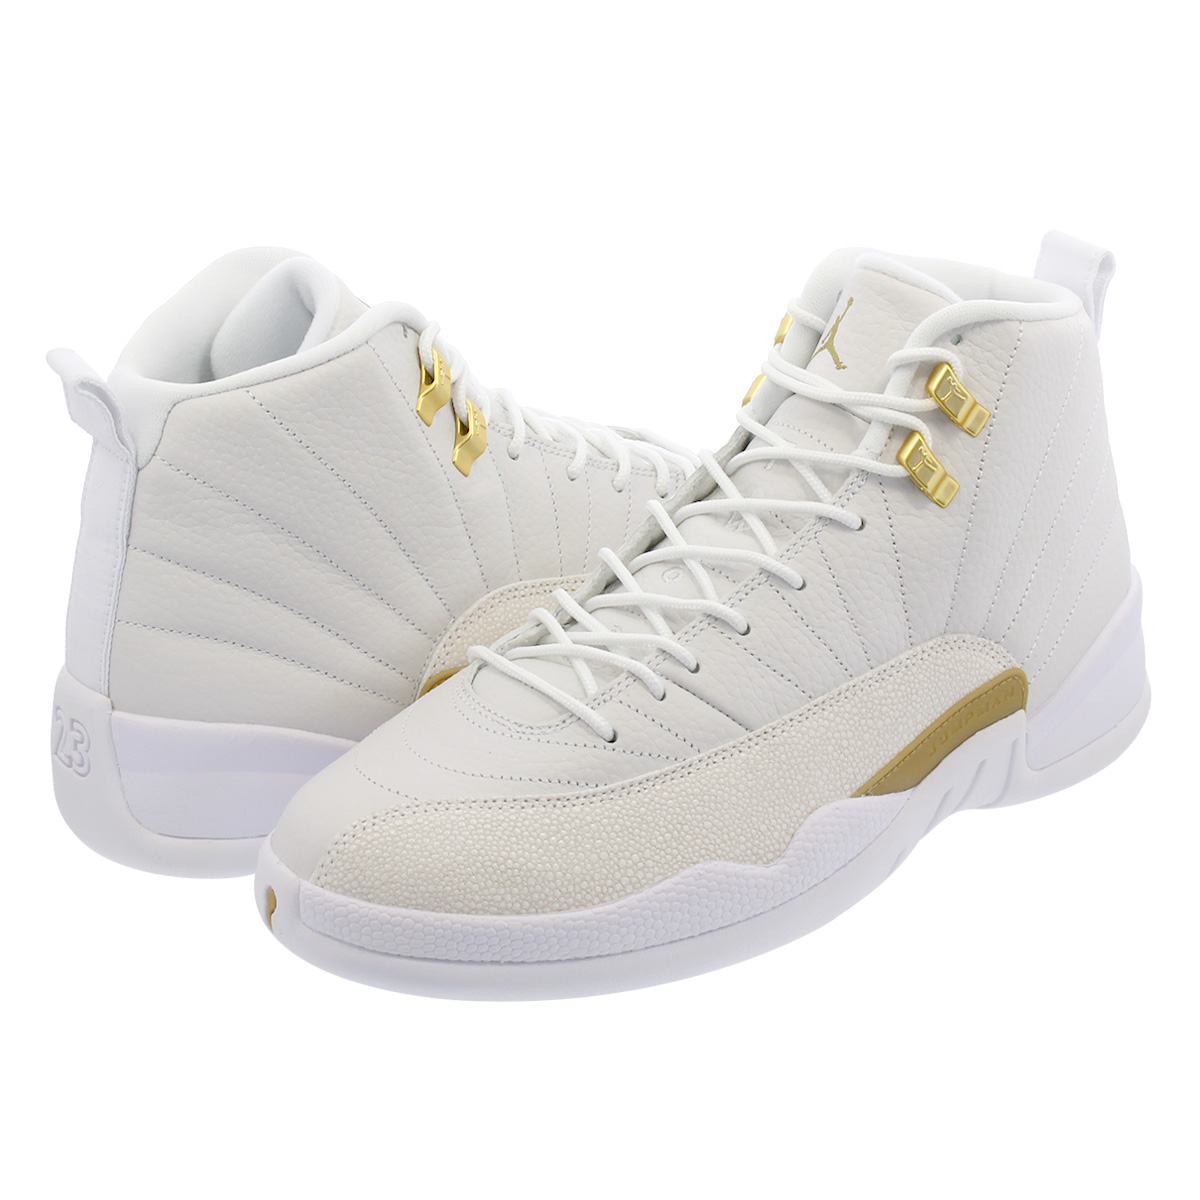 competitive price 382a9 39e33 NIKE AIR JORDAN 12 RETRO Nike Air Jordan 12 nostalgic WHITE/METALLIC GOLD  873,864-102